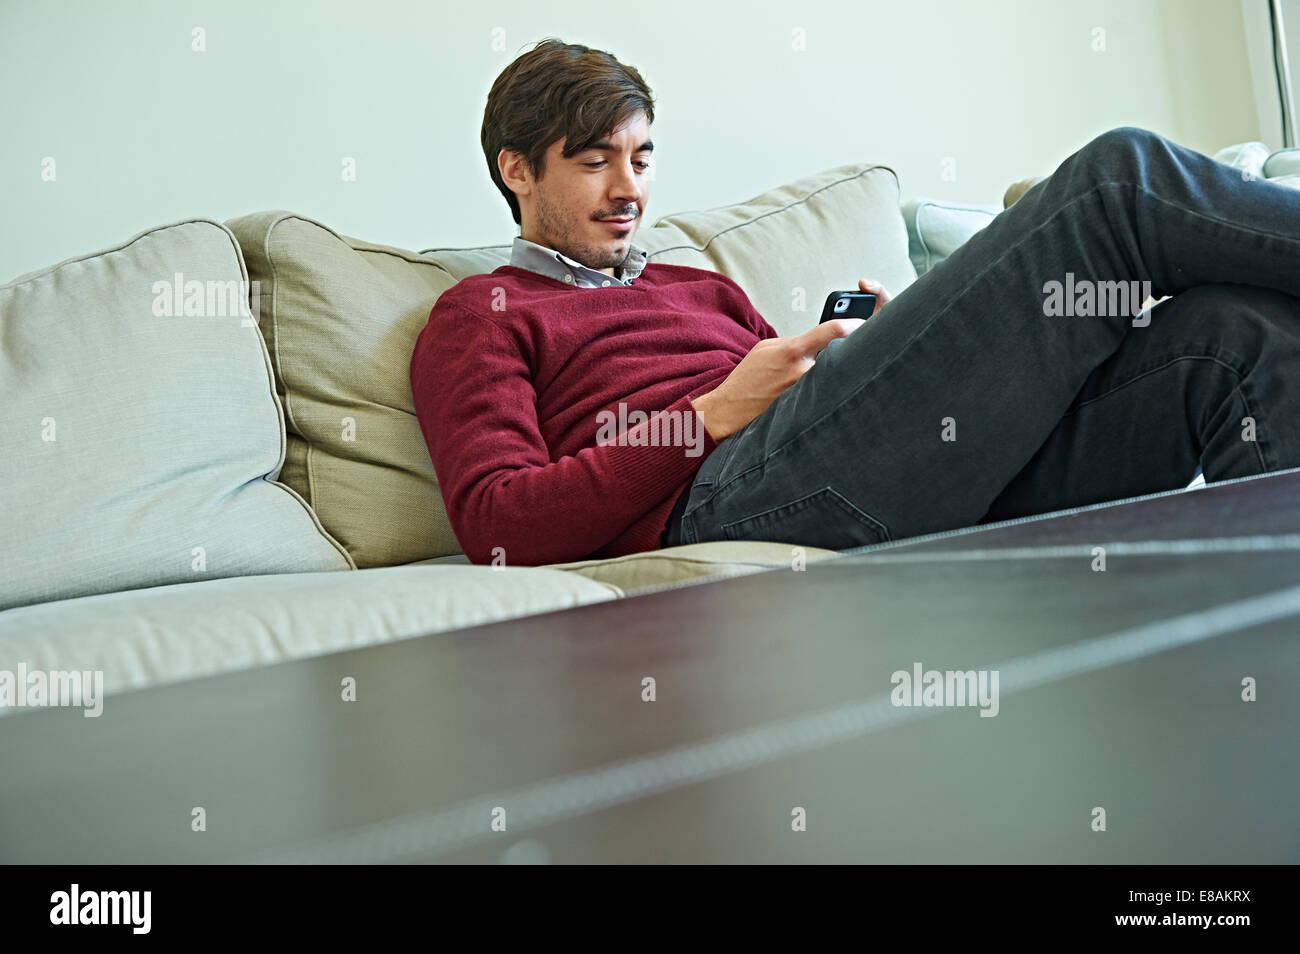 Man using smartphone on sofa - Stock Image